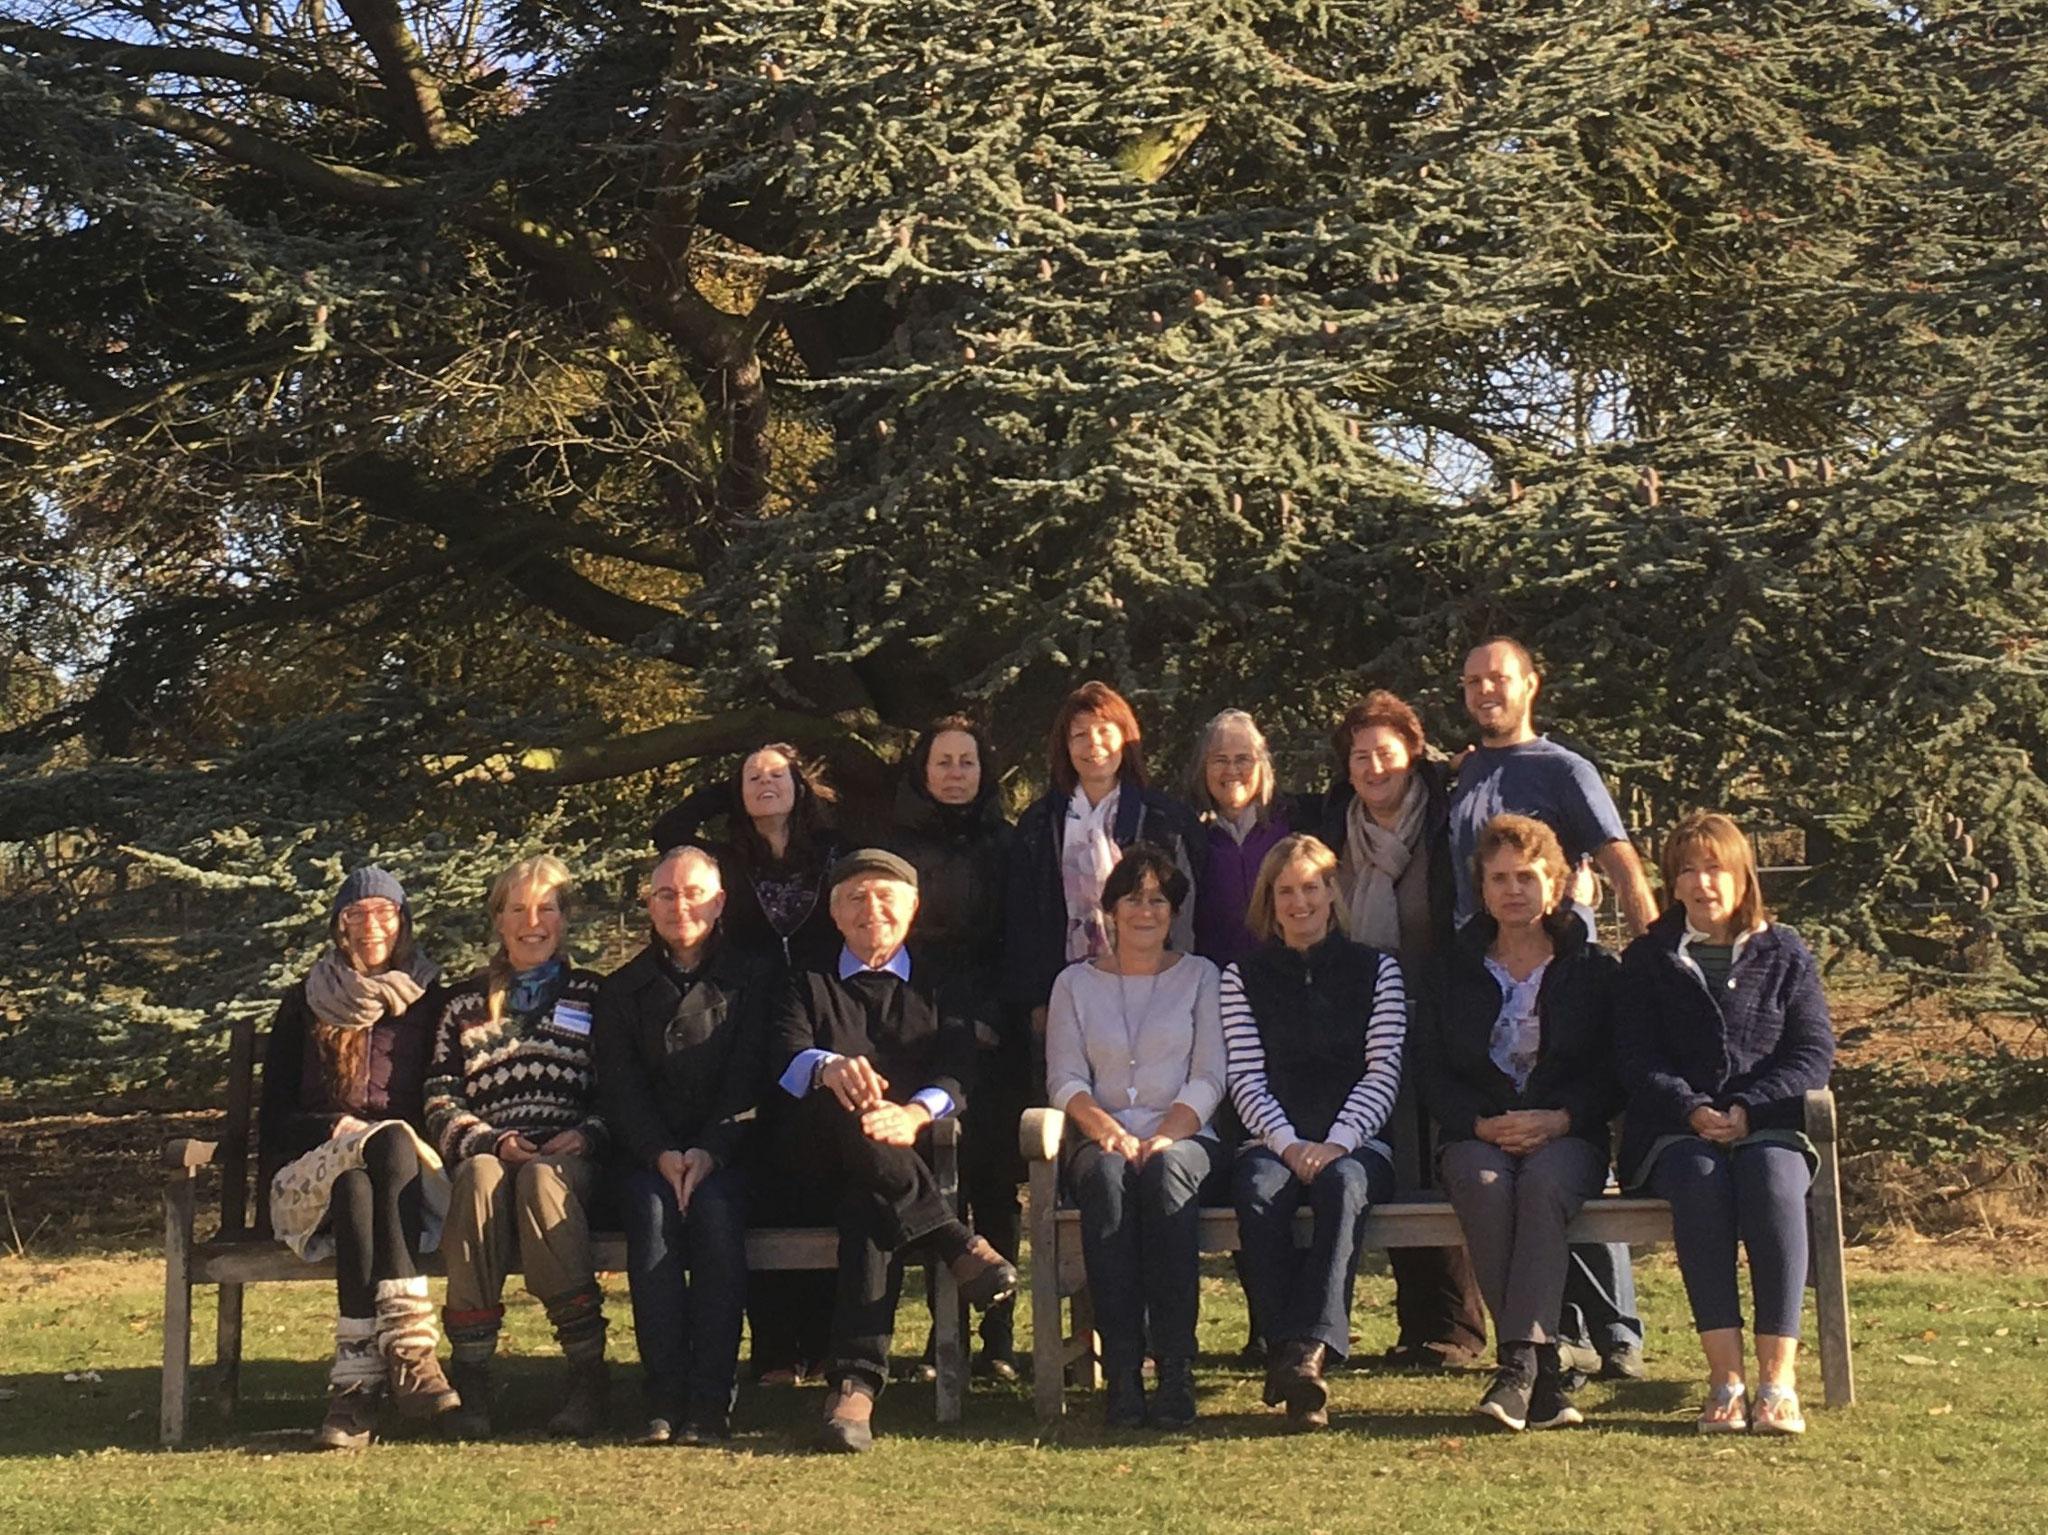 CADD class in the United Kingdom 2016